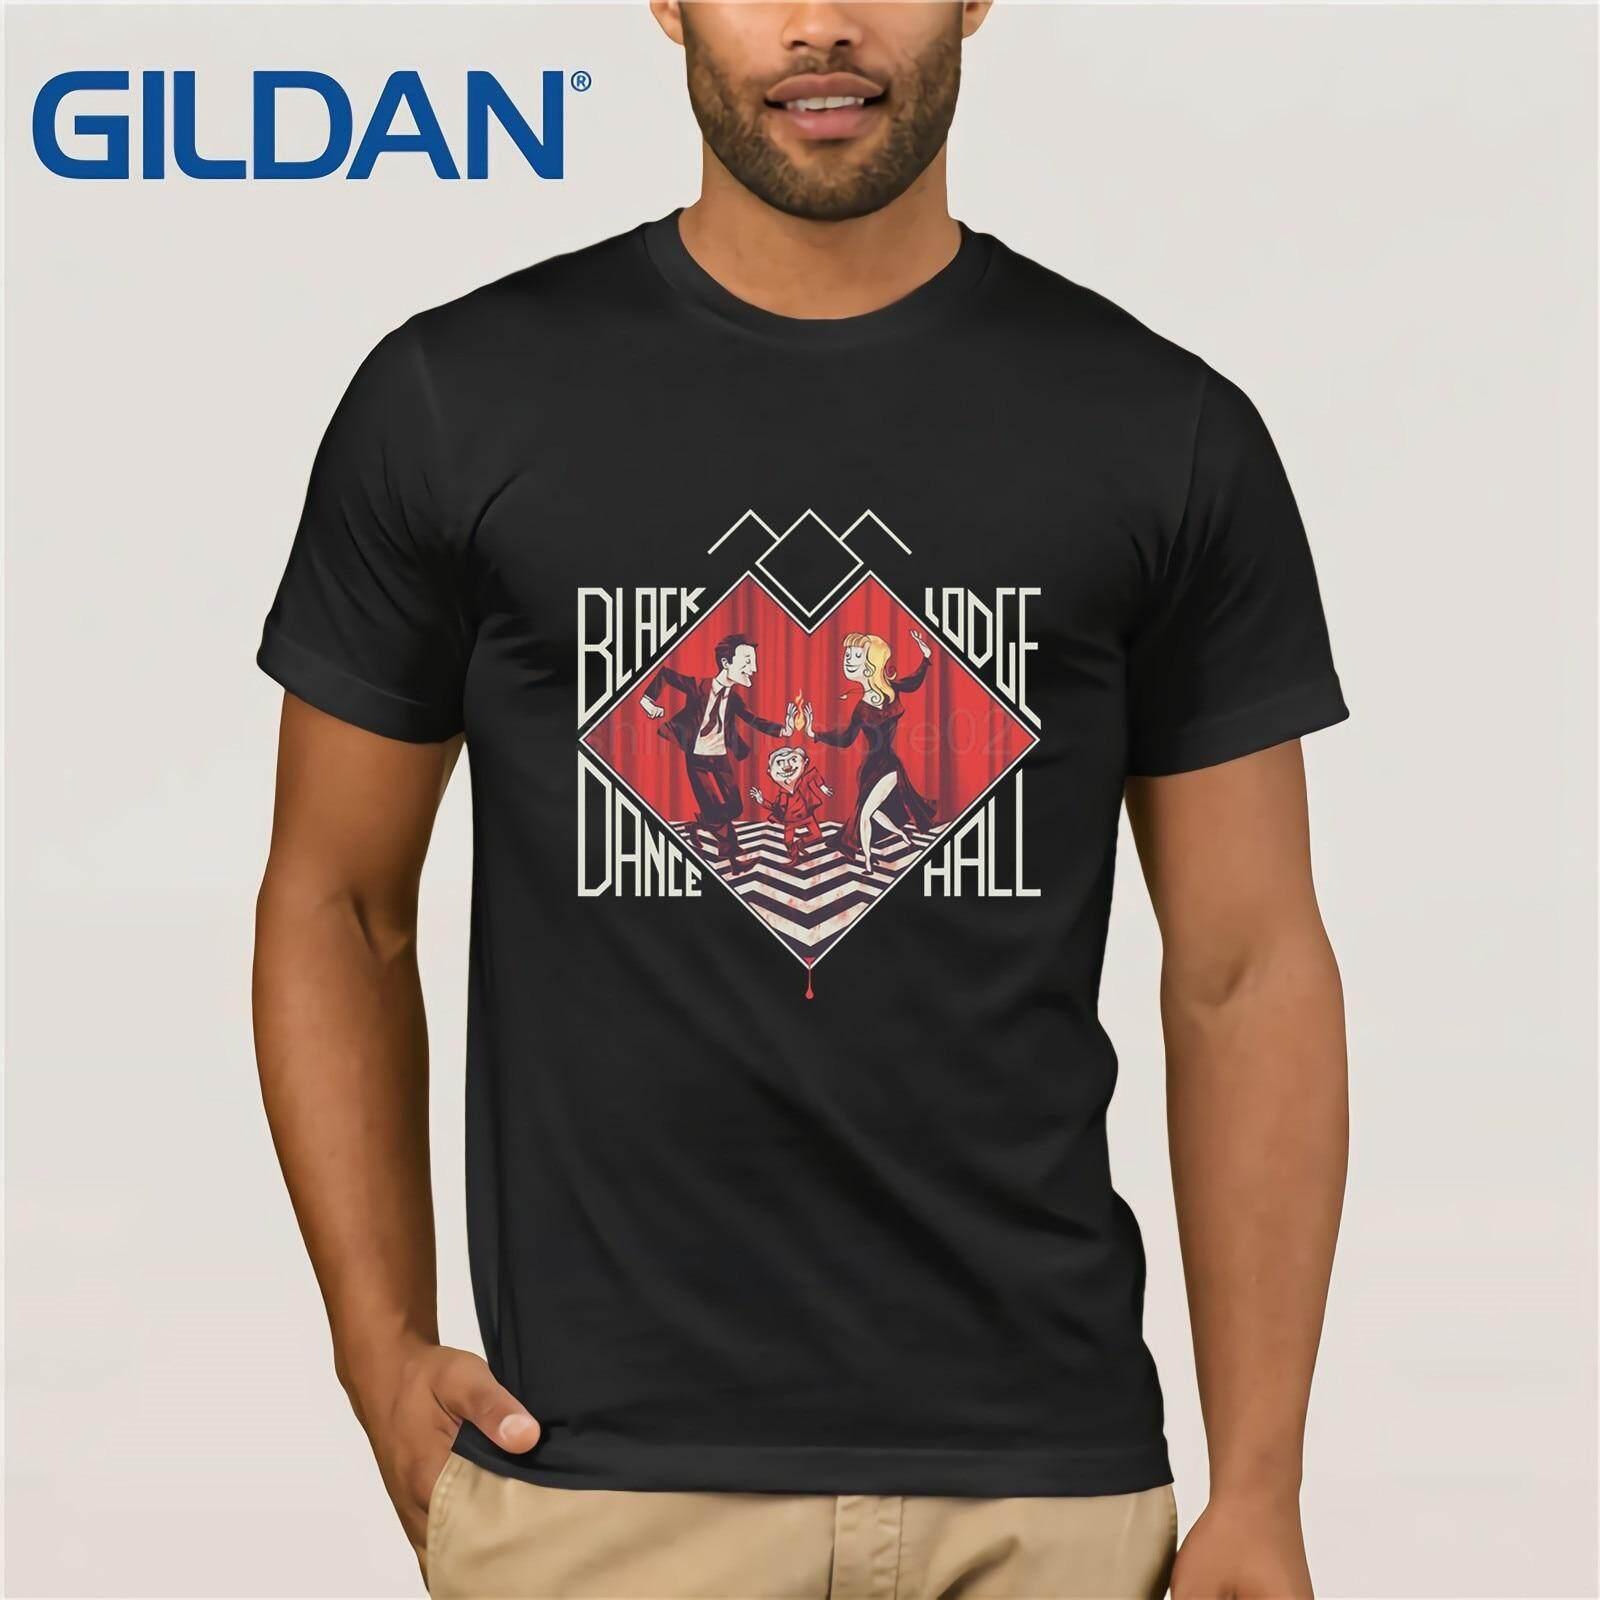 3b3b4c75 Twin Peaks Black Lodge Dance T-Shirt David Lynch Dale Cooper Men's Tee  Print T